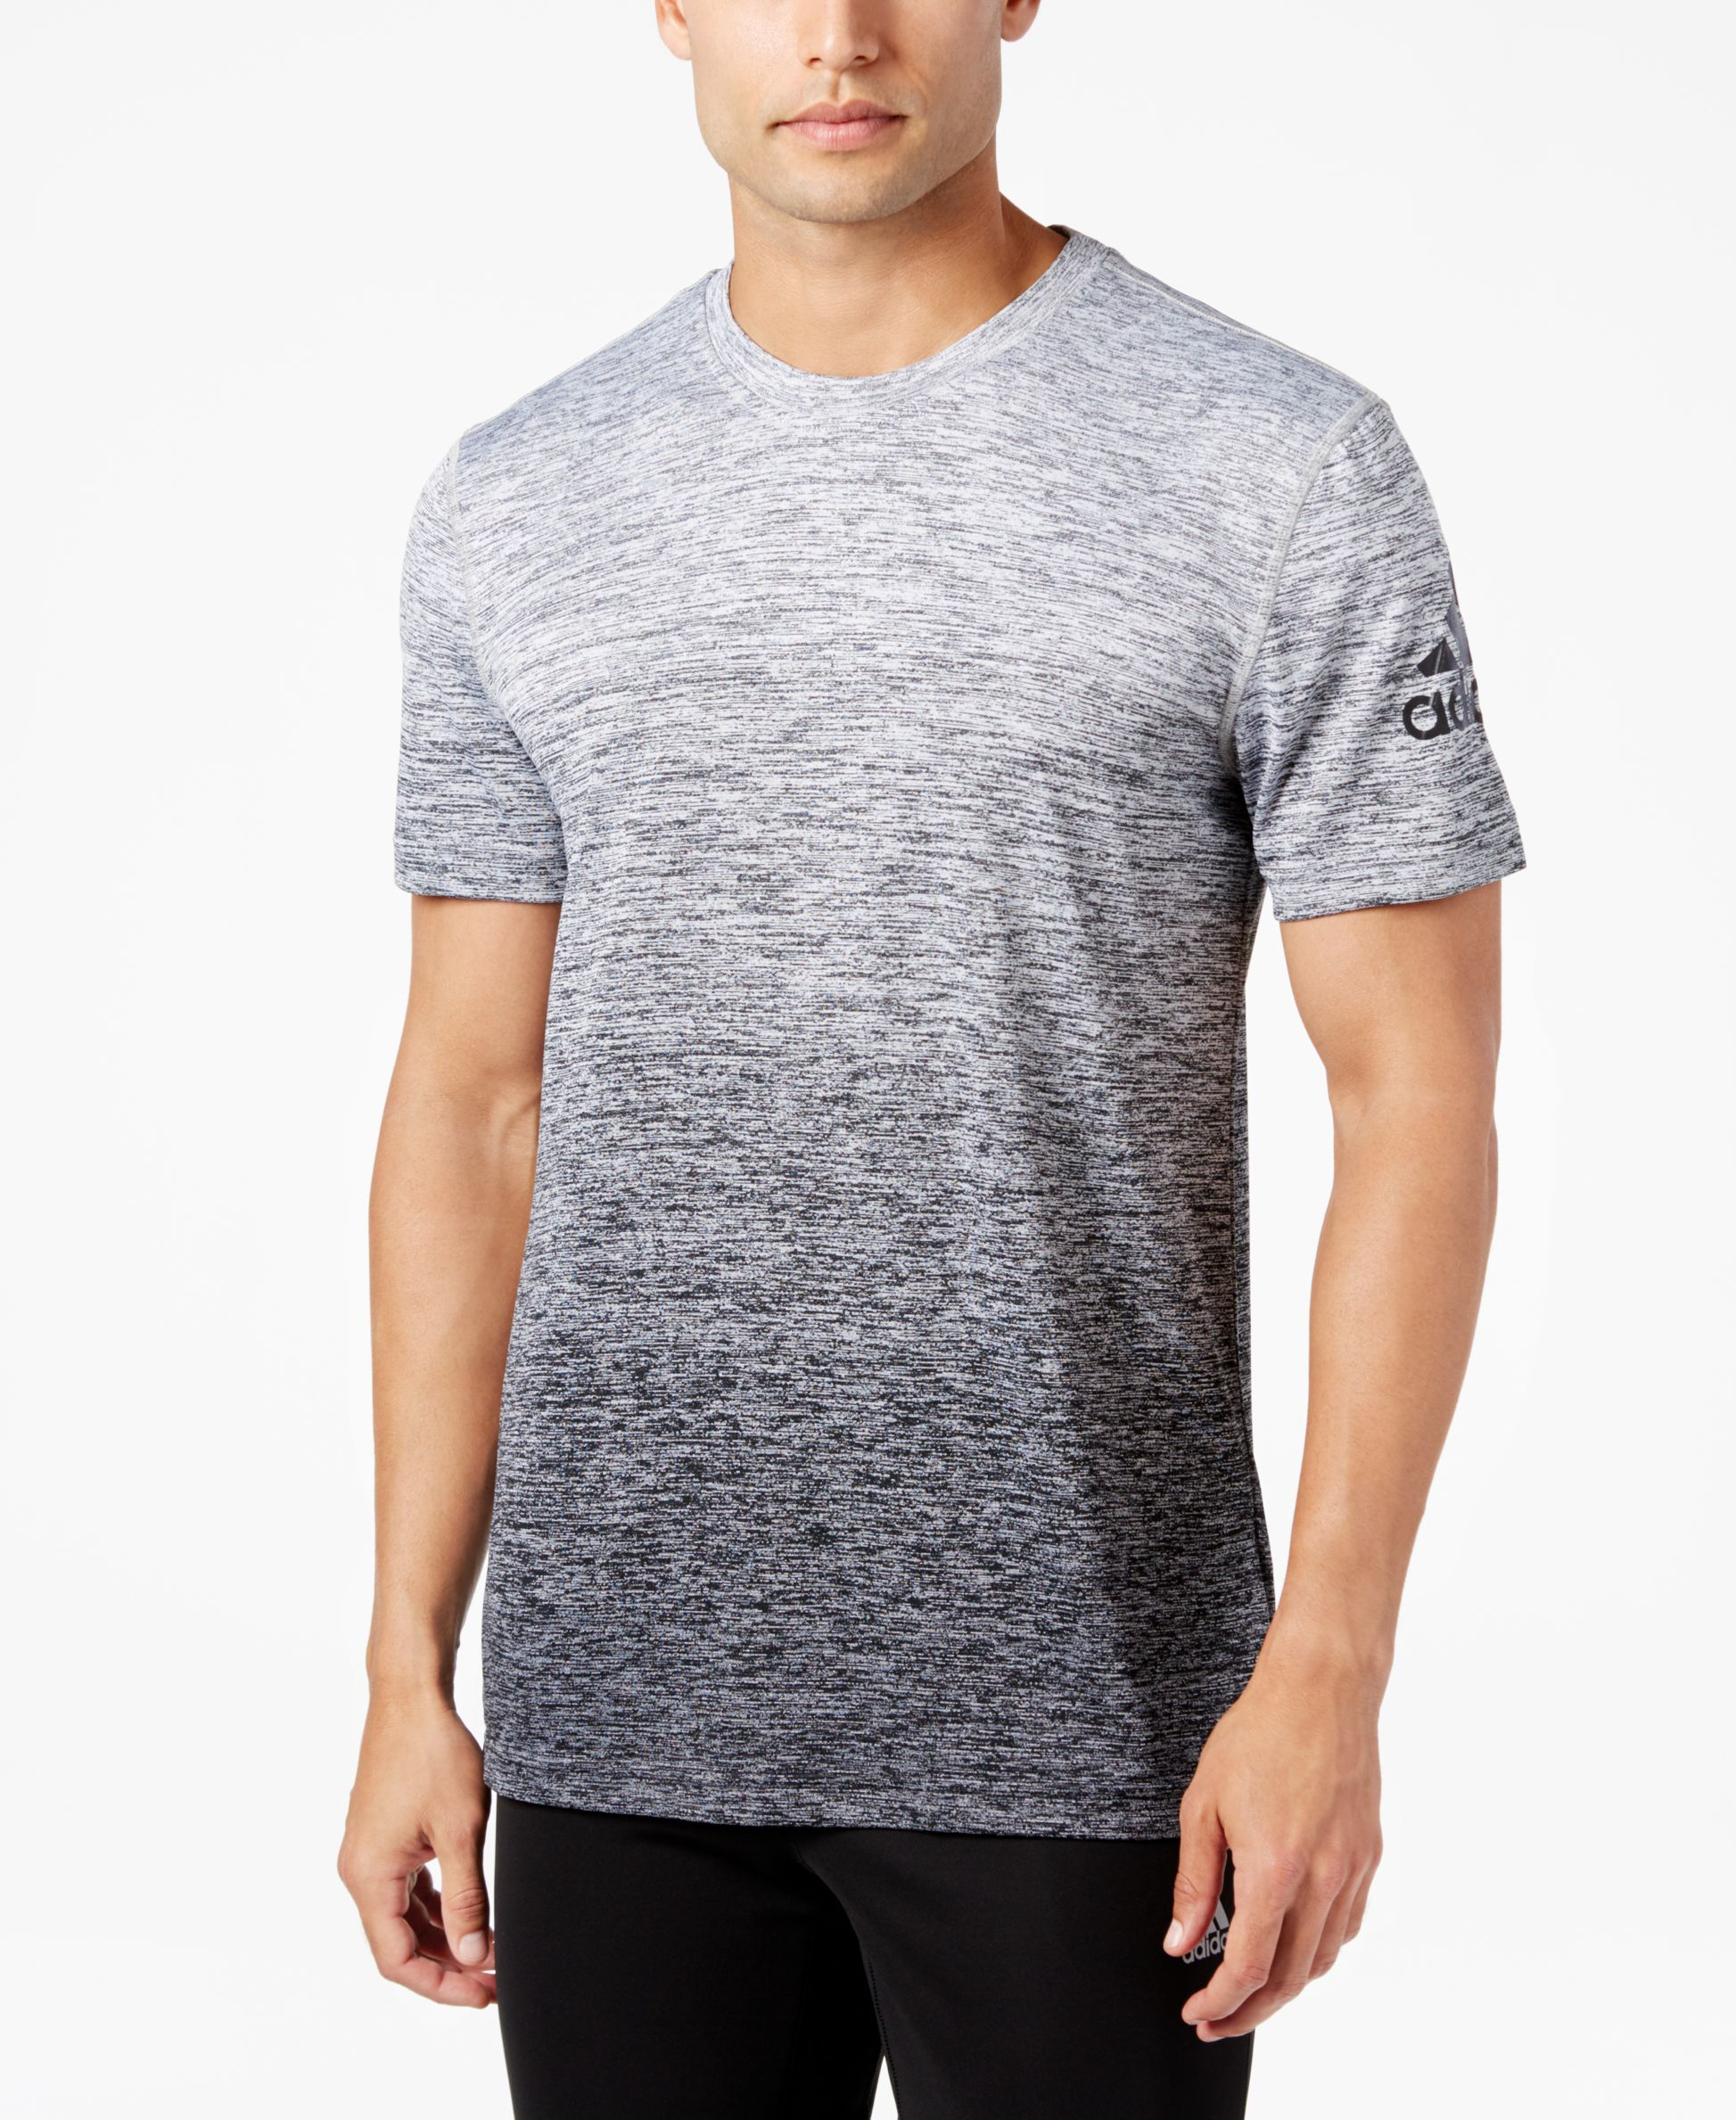 Rabatt Keep going rep after rep in this adidas T shirt, designed  Kostenloser Versand